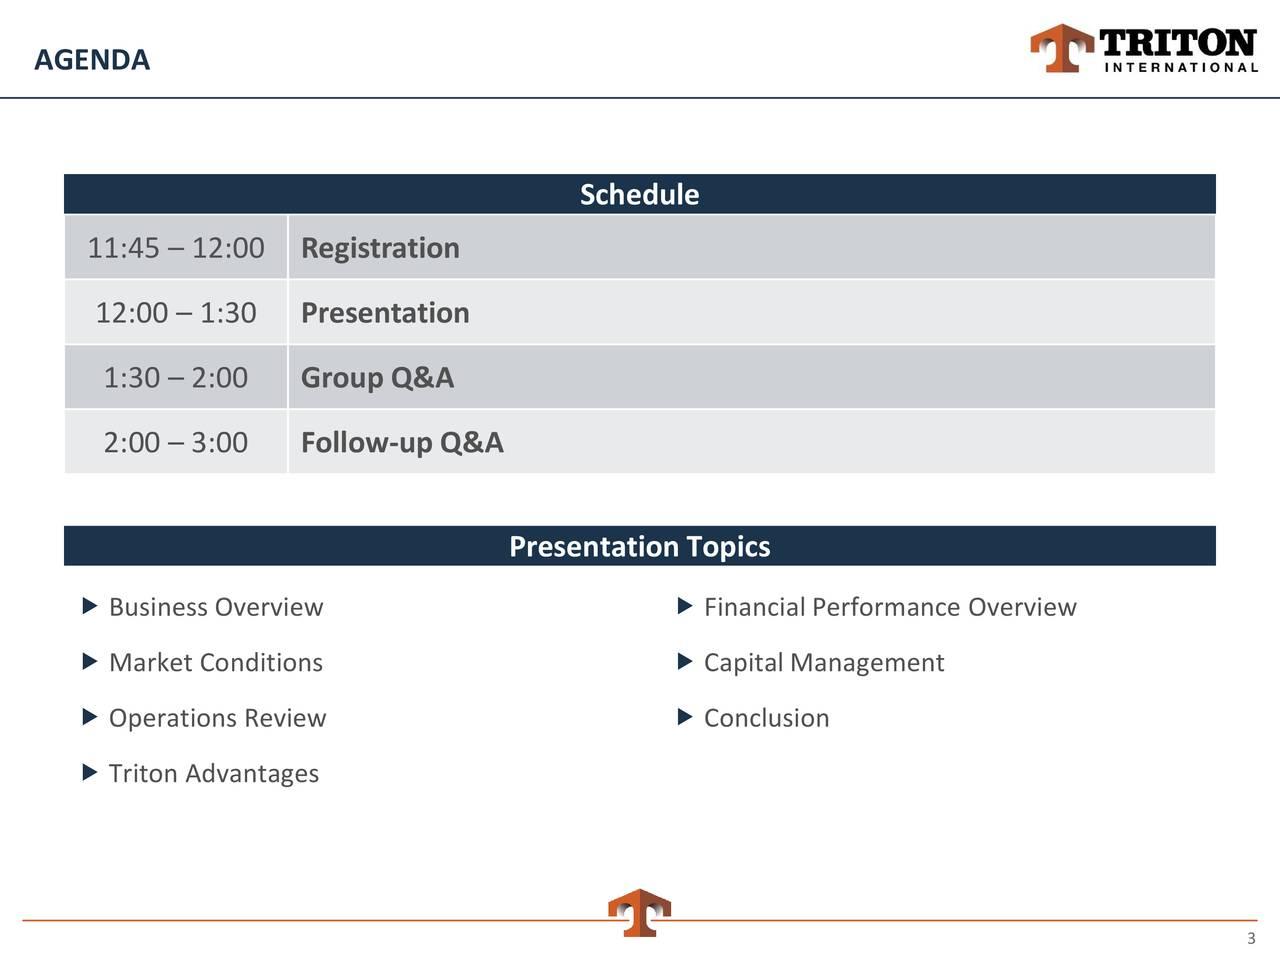 Schedule 11:45 – 12:00 Registration 12:00 – 1:30 Presentation 1:30 – 2:00 Group Q&A 2:00 – 3:00 Follow-up Q&A Presentation Topics  Business Overview  Financial Performance Overview  Market Conditions  Capital Management  Operations Review  Conclusion  Triton Advantages 3